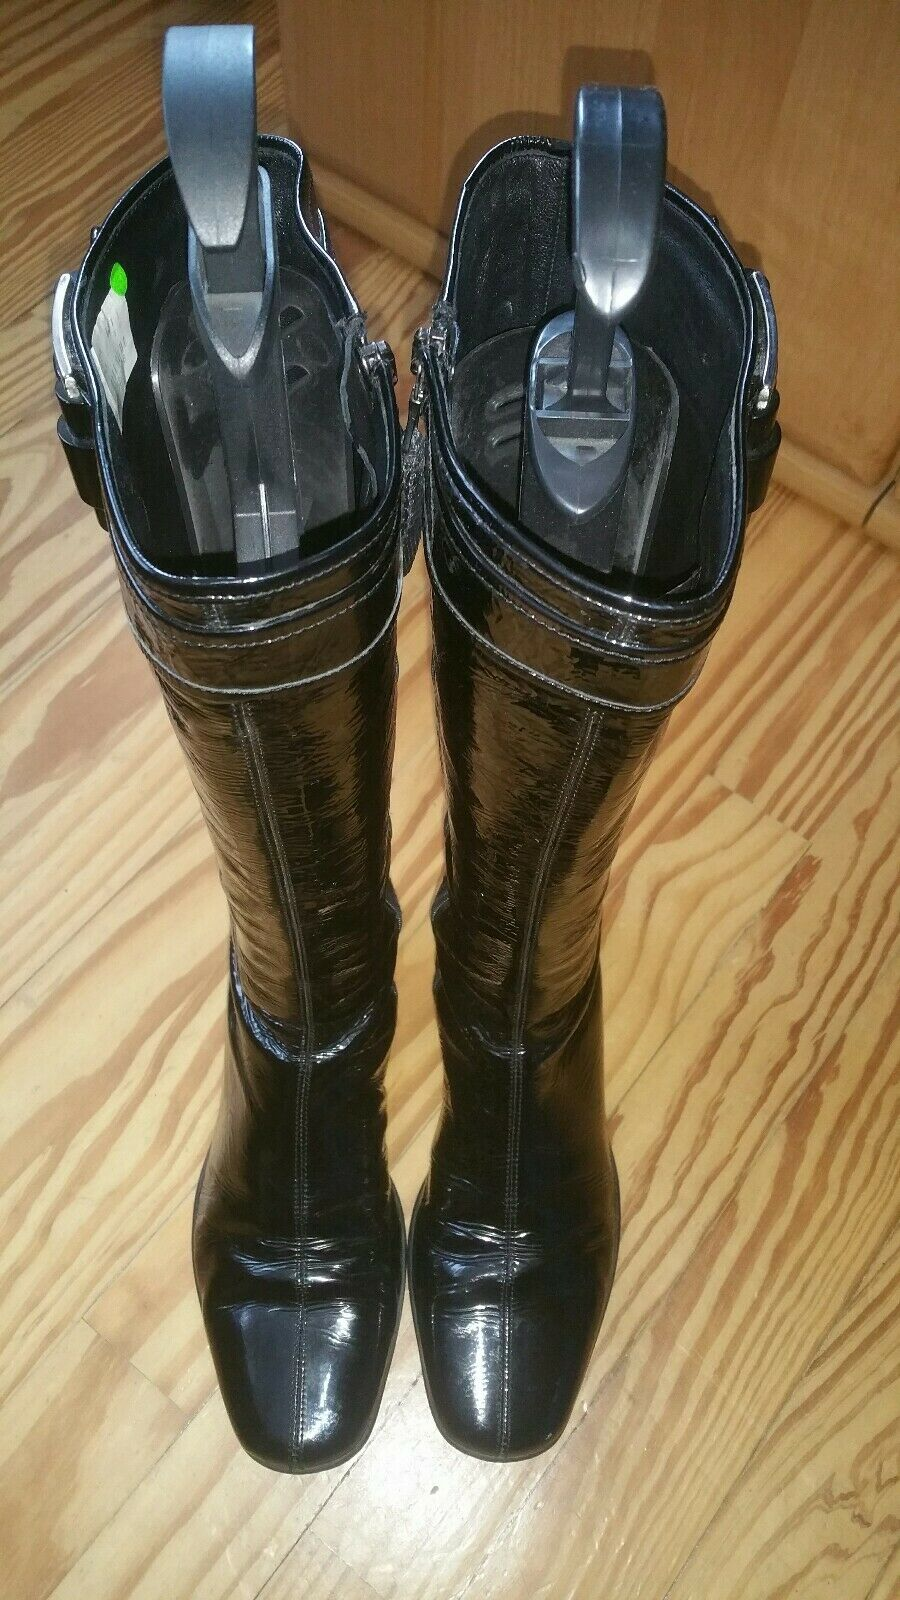 PRADA  Luxus  Stiefel Naplak Lackleder black  Gr. 38 black  NP